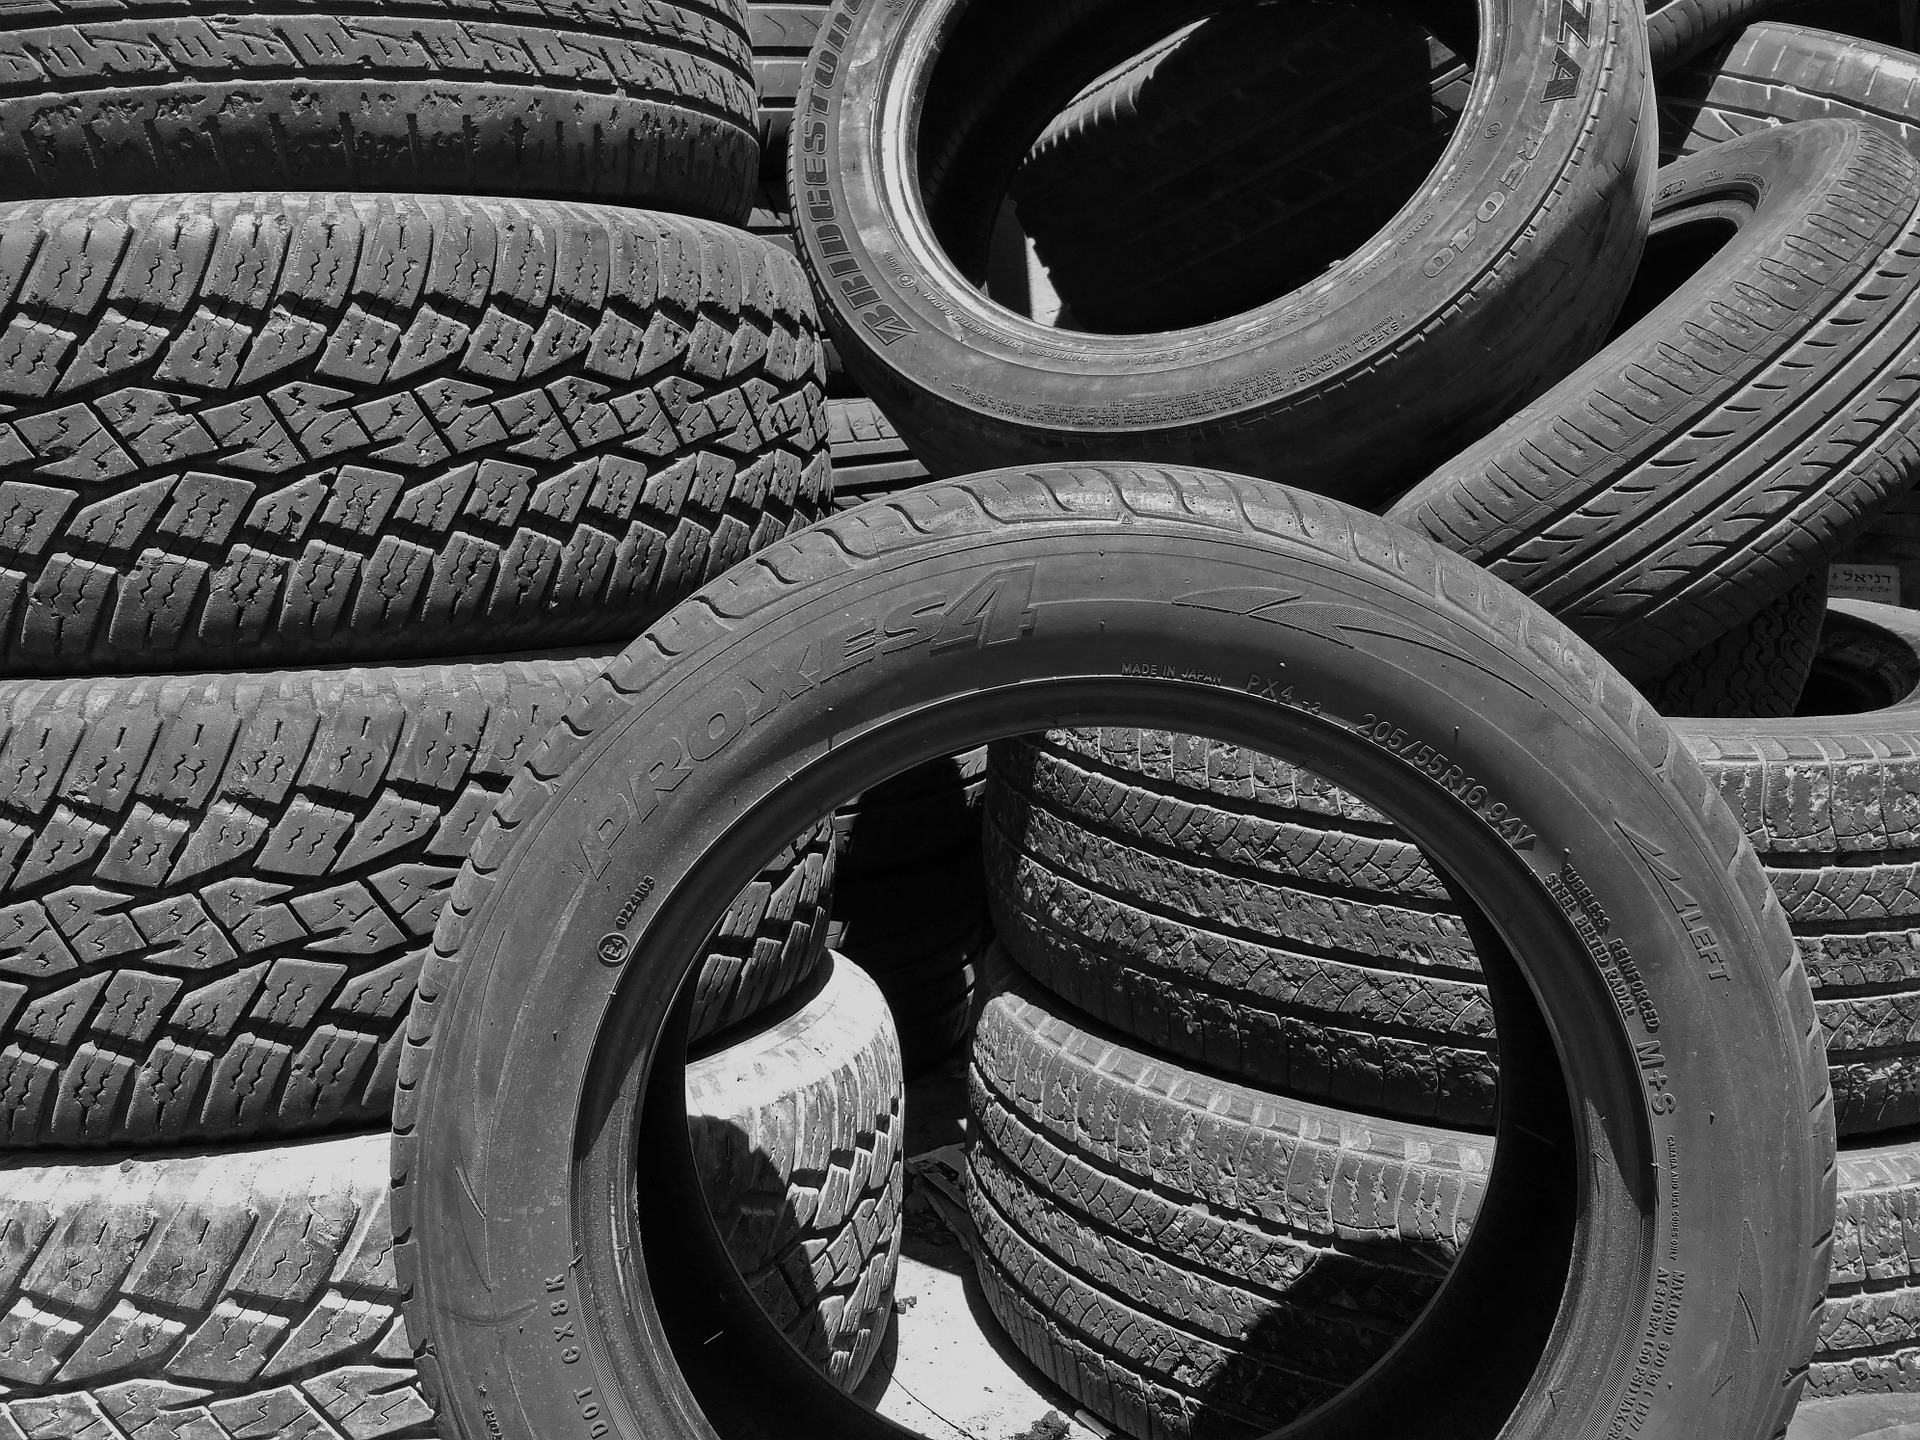 tires-913588_1920